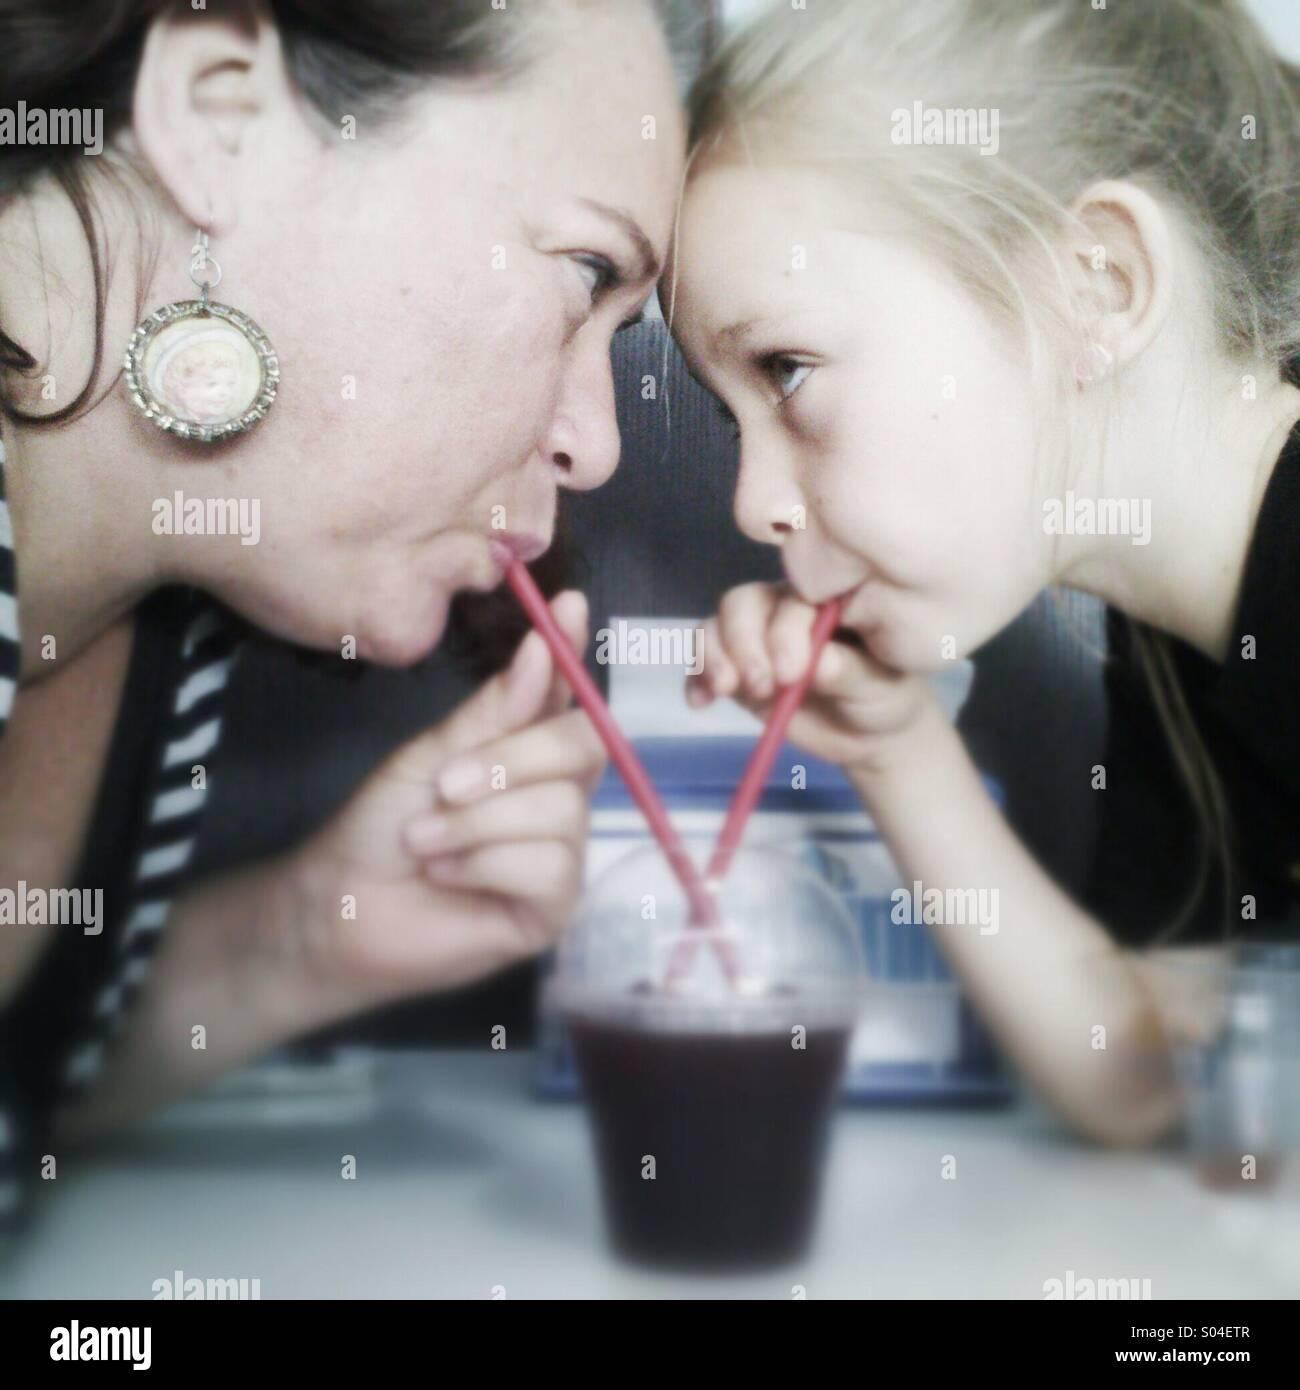 Madre e hija bebiendo un slushie. Imagen De Stock